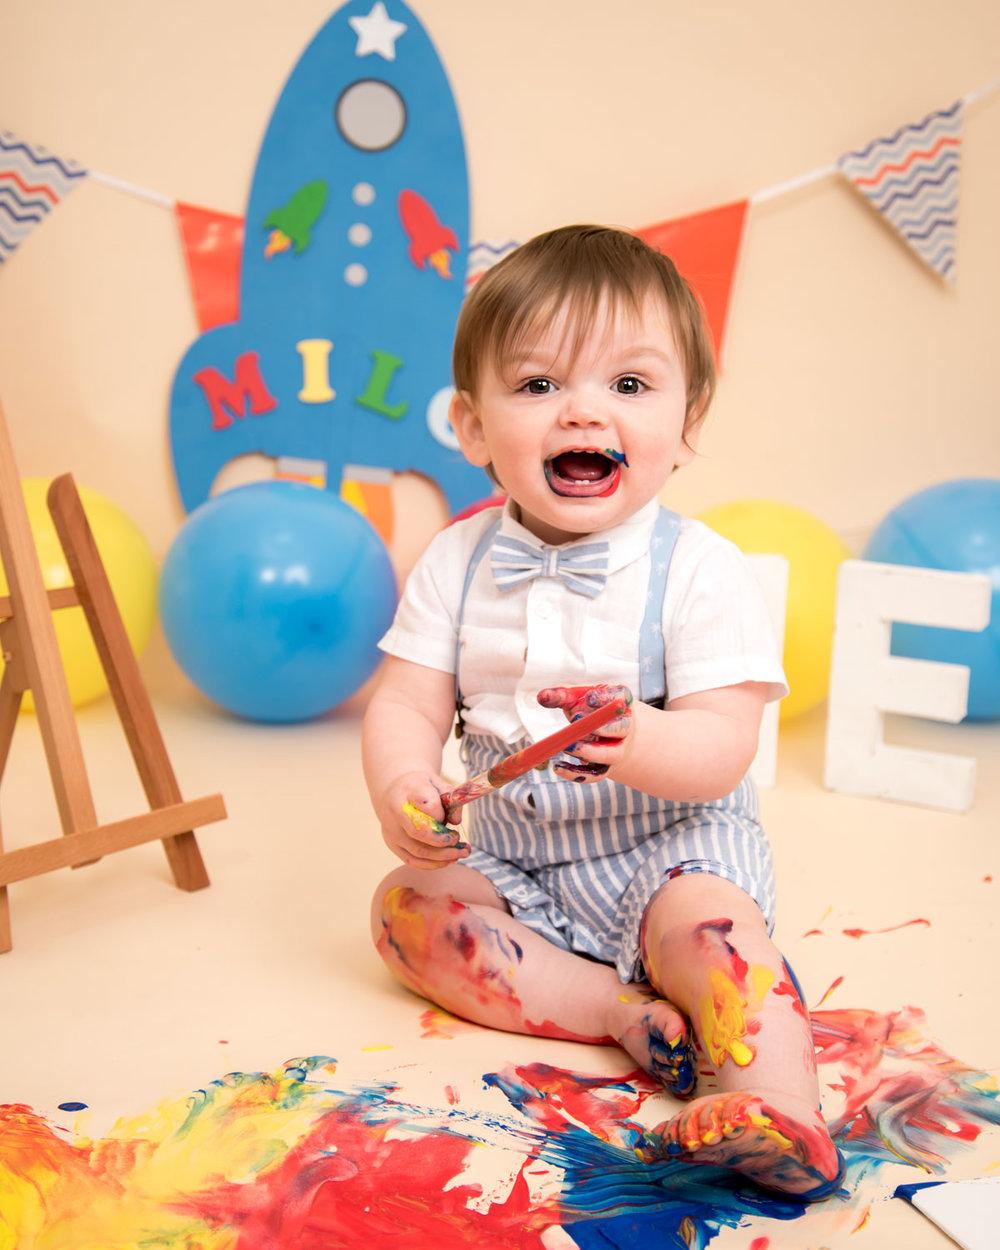 Baby_cake_smash_photography_Ely_Cambridgeshire_paint_splash_cake_smash_alternative_messy_play_first_birthday_for_milo (3).jpg